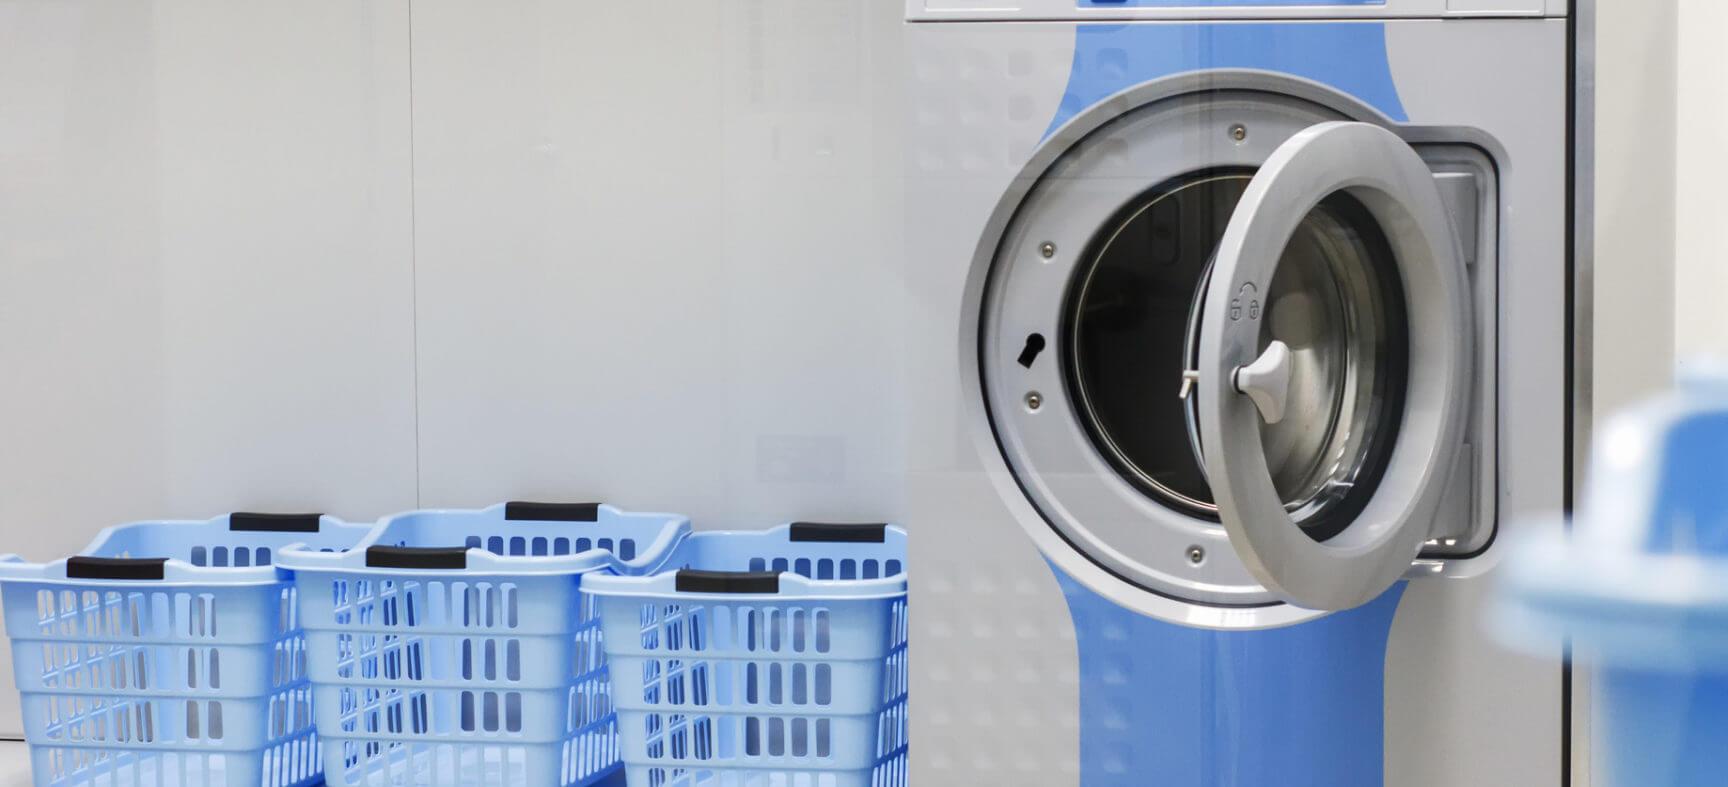 Perché aprire una lavanderia self service